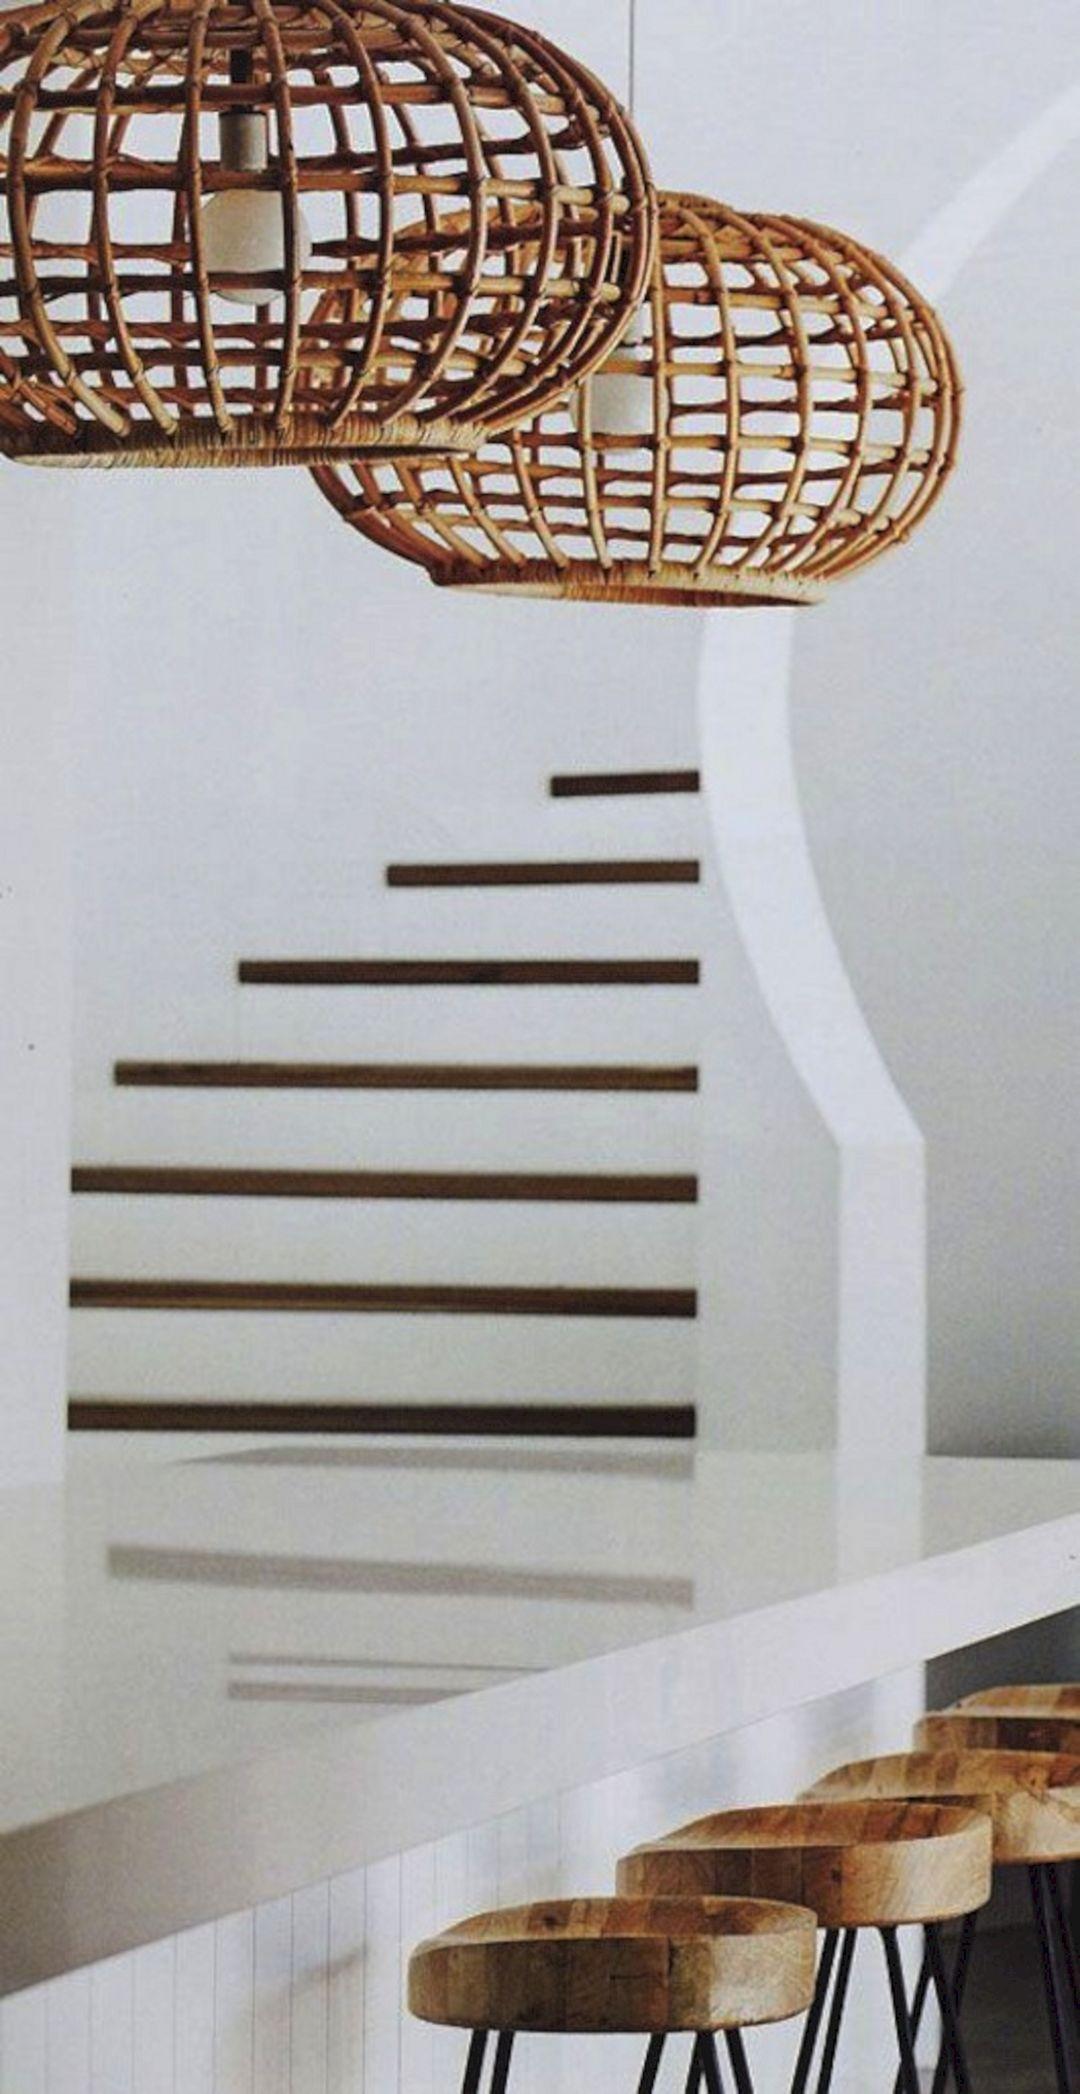 Woven Basket Lamp : Wicker basket lamp shades